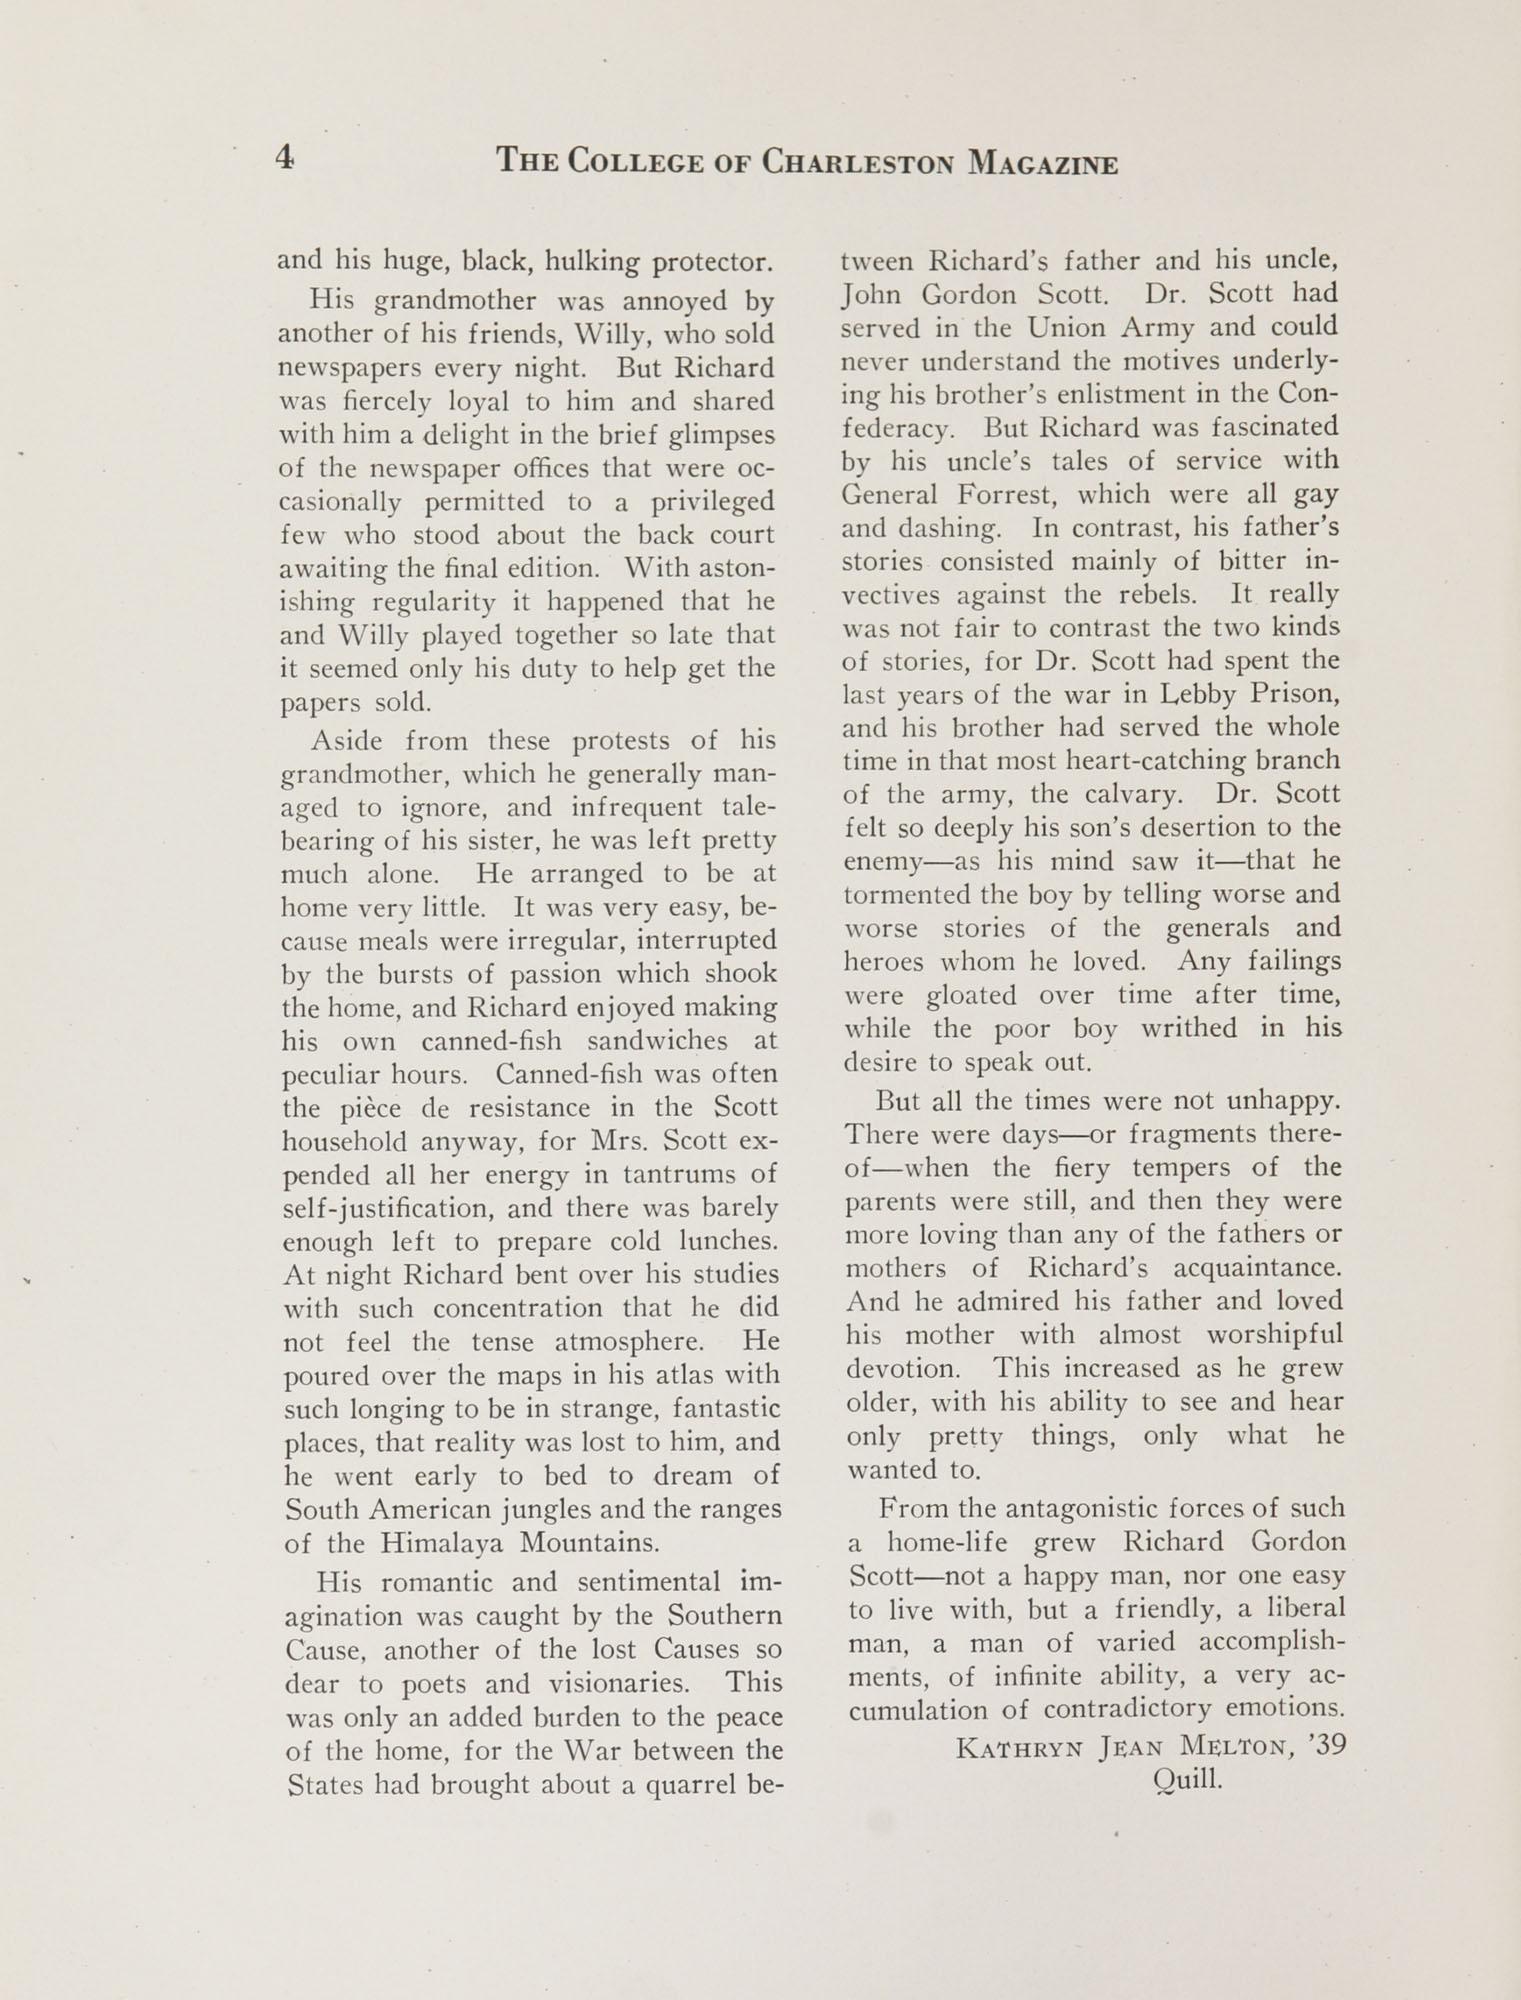 College of Charleston Magazine, 1937-1938, Vol. XXXXI No. 1, page 4